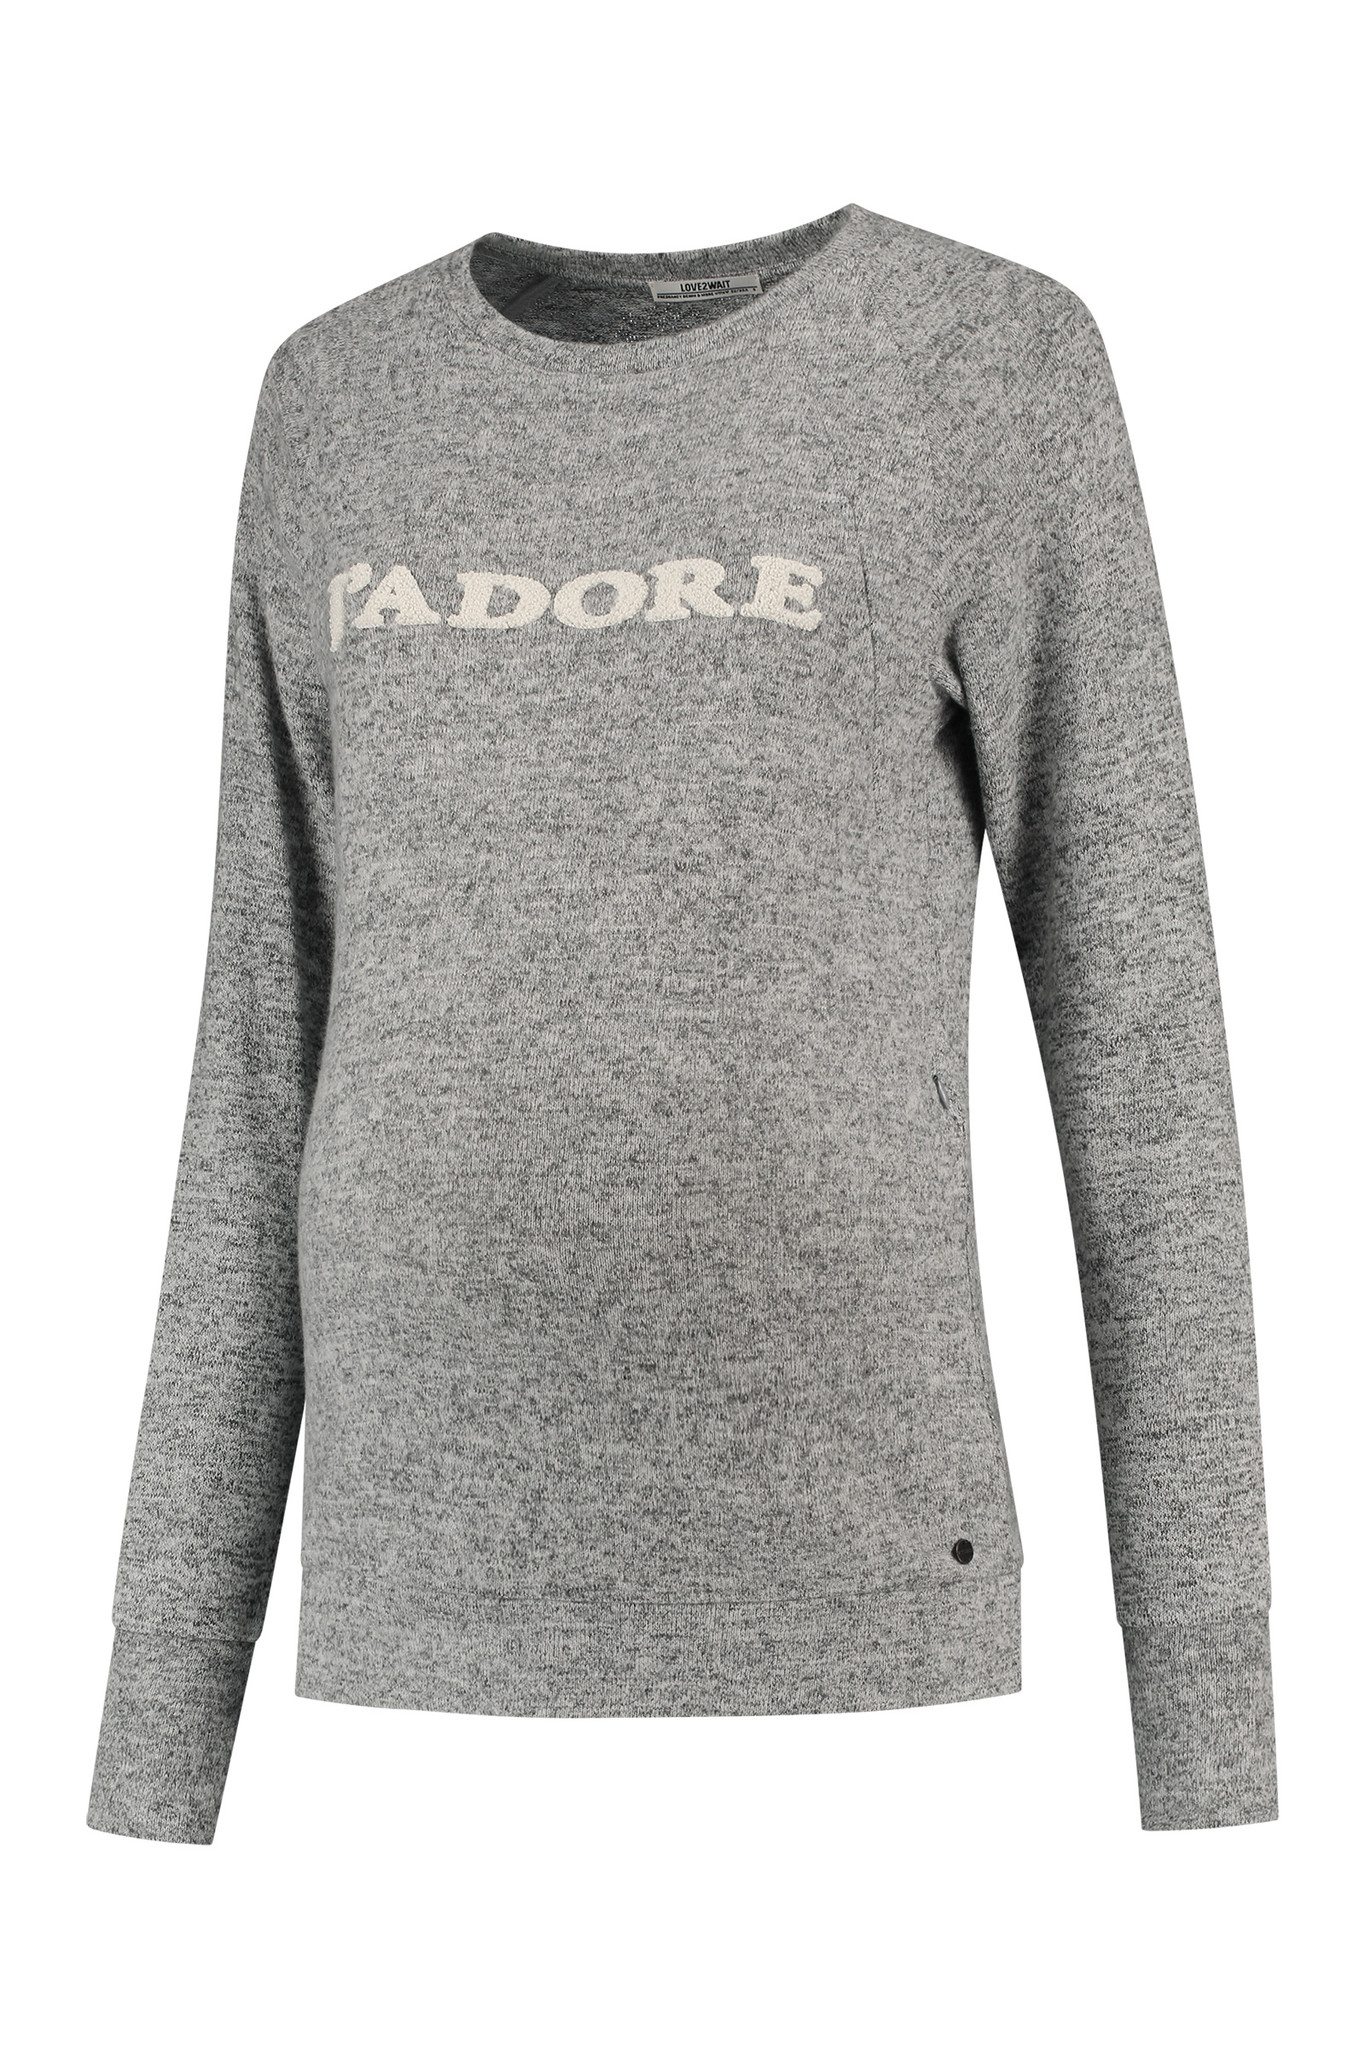 Umstandssweatshirt Stillsweatshirt J'adore